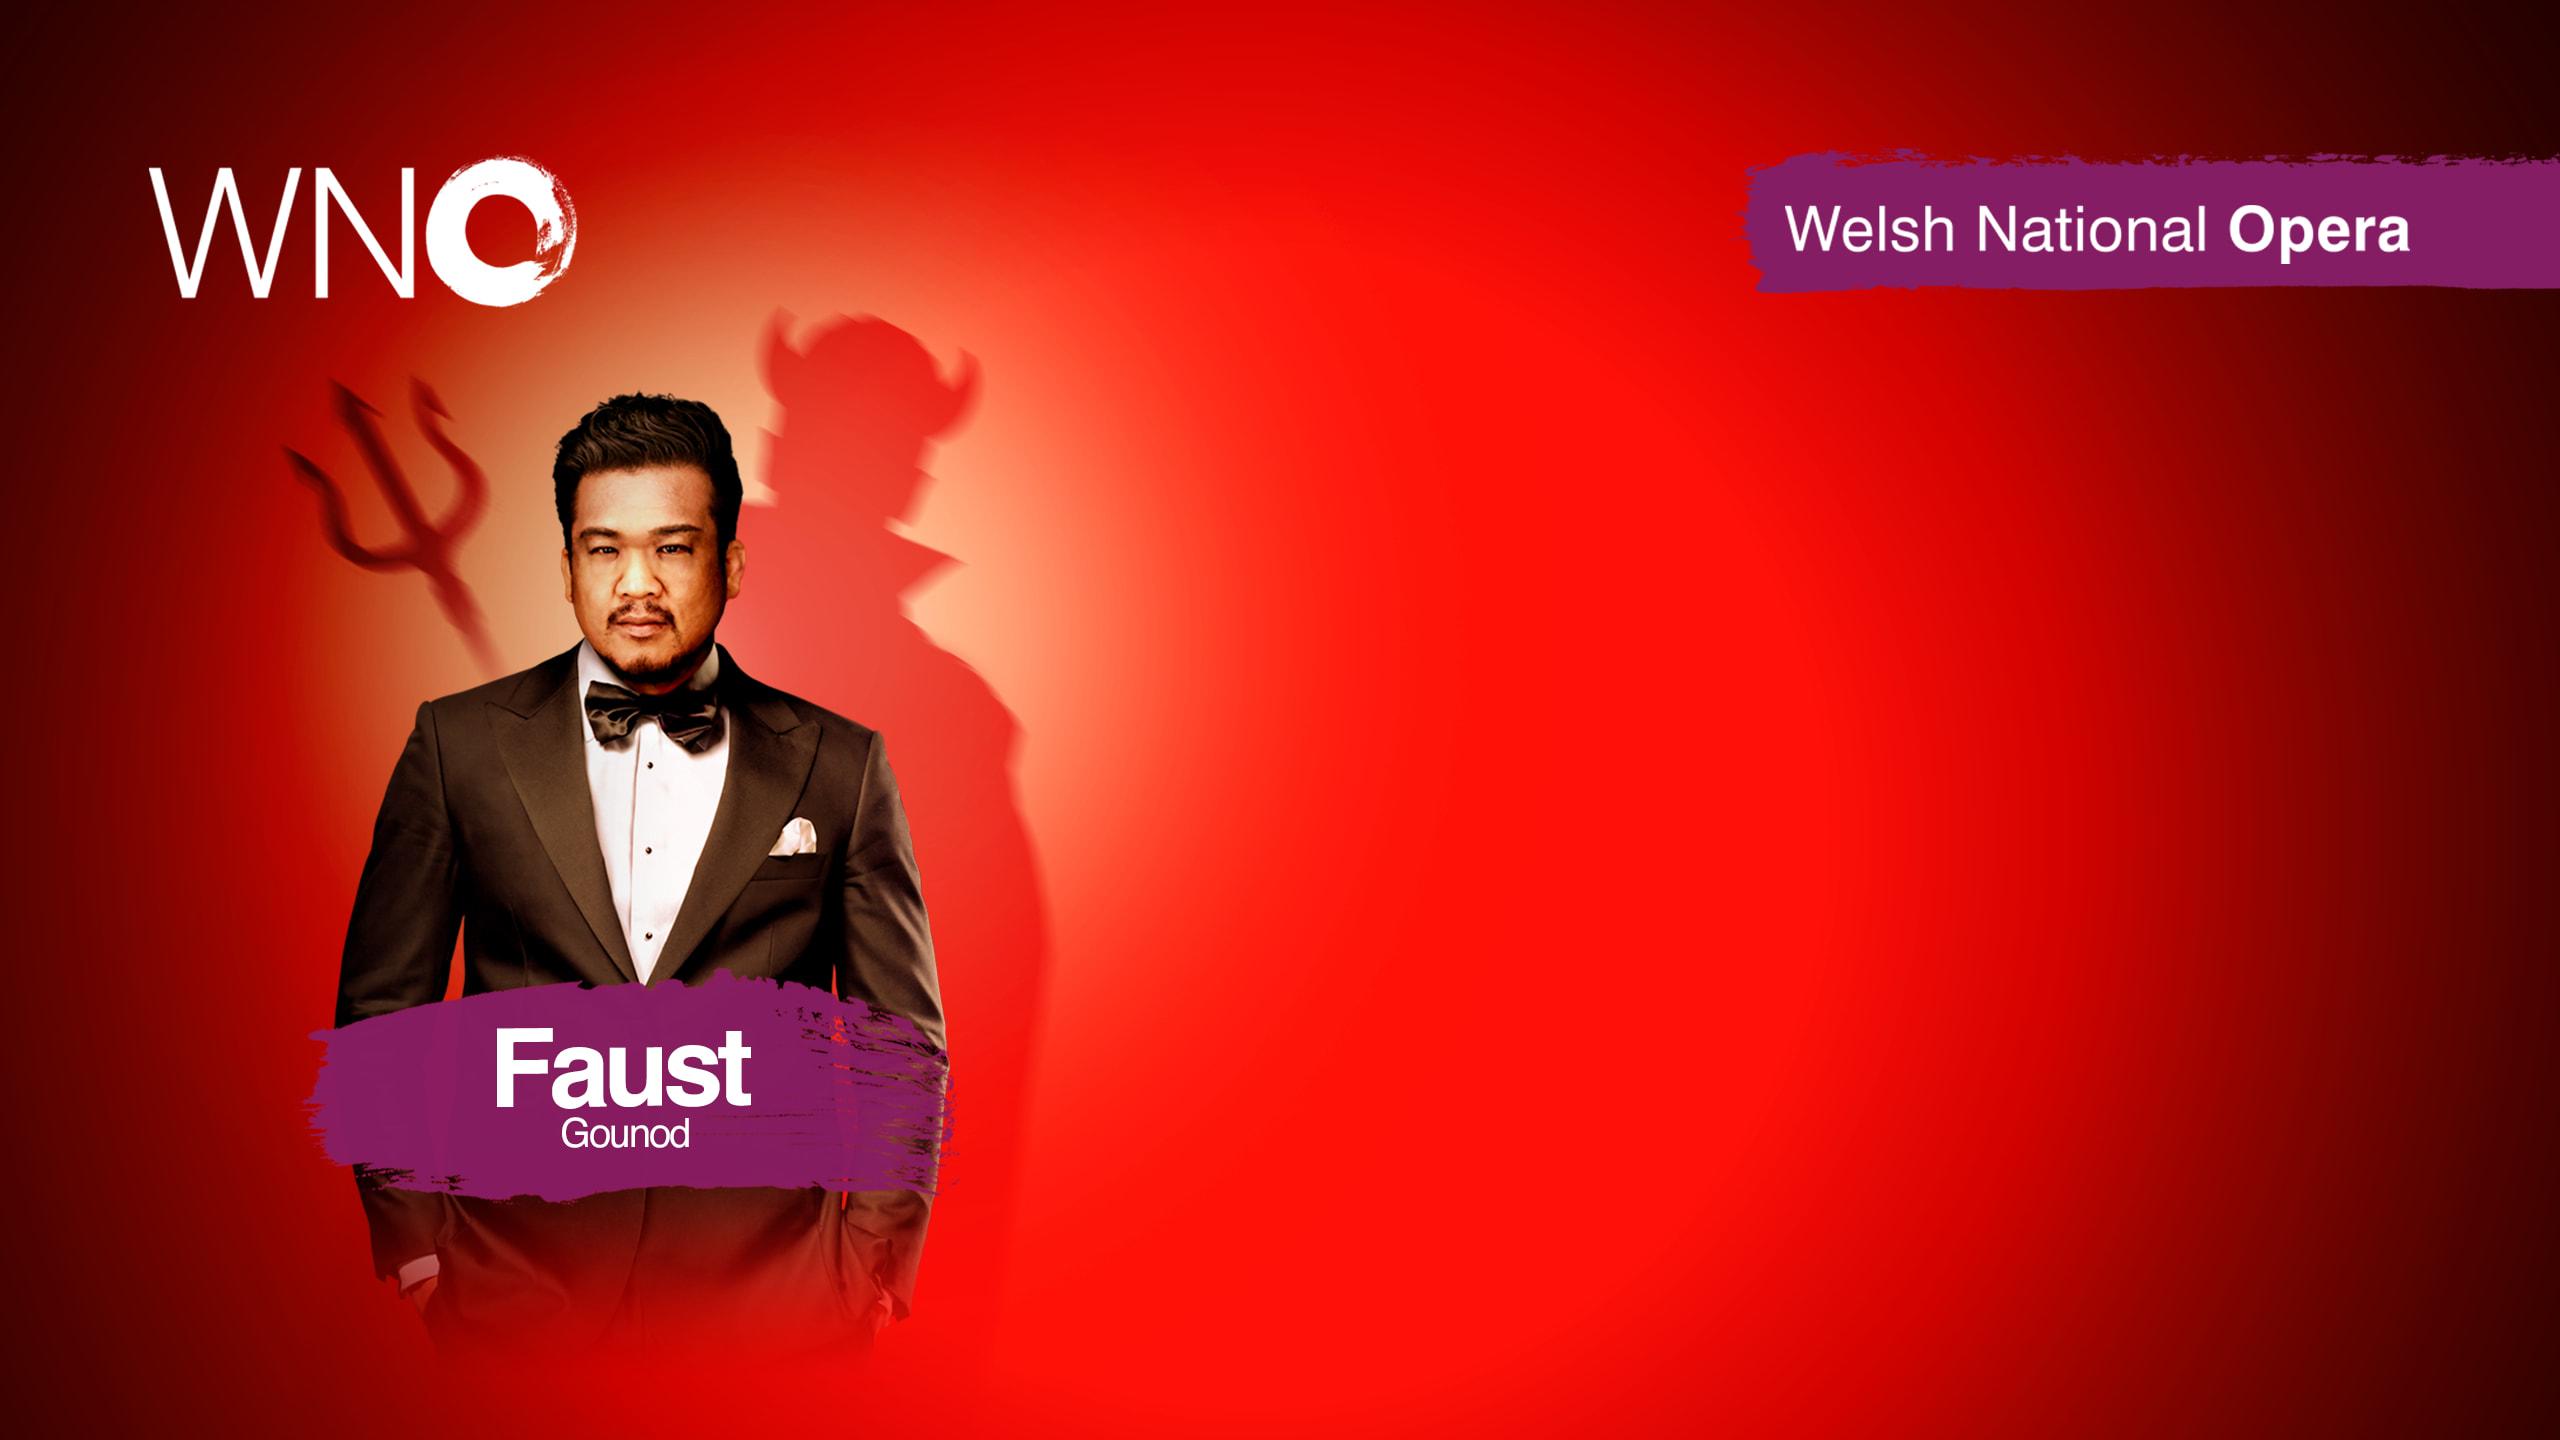 Welsh National Opera - Faust Prod Shot